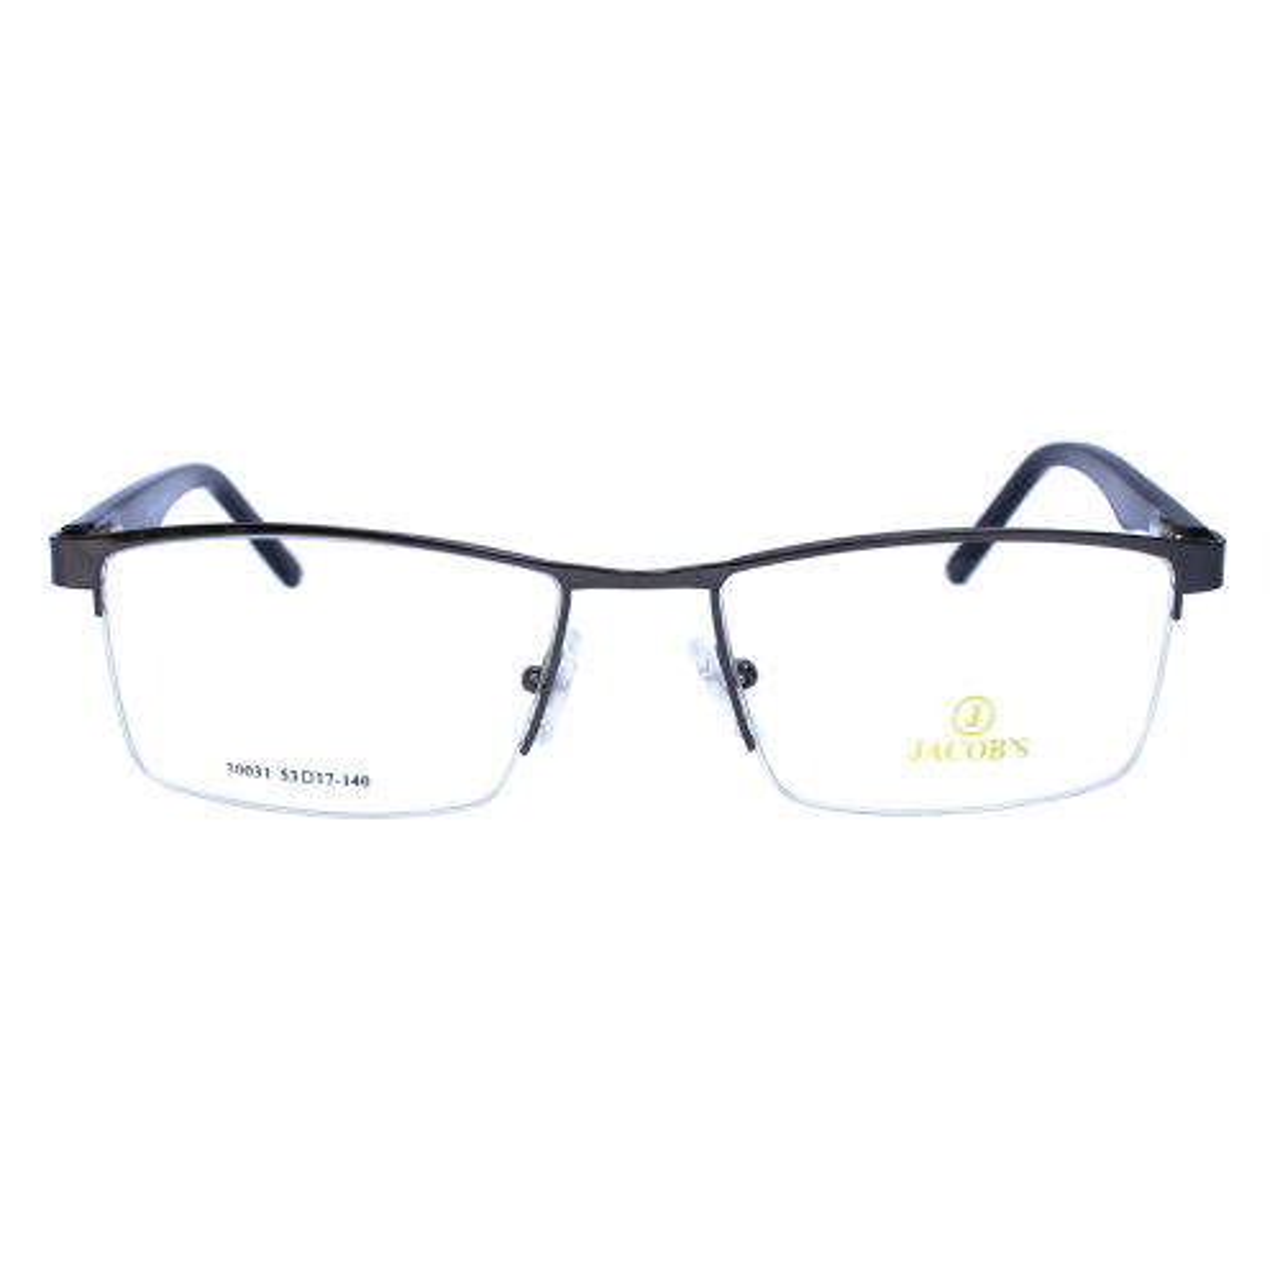 فریم عینک طبی جاکوبز مدل 30031